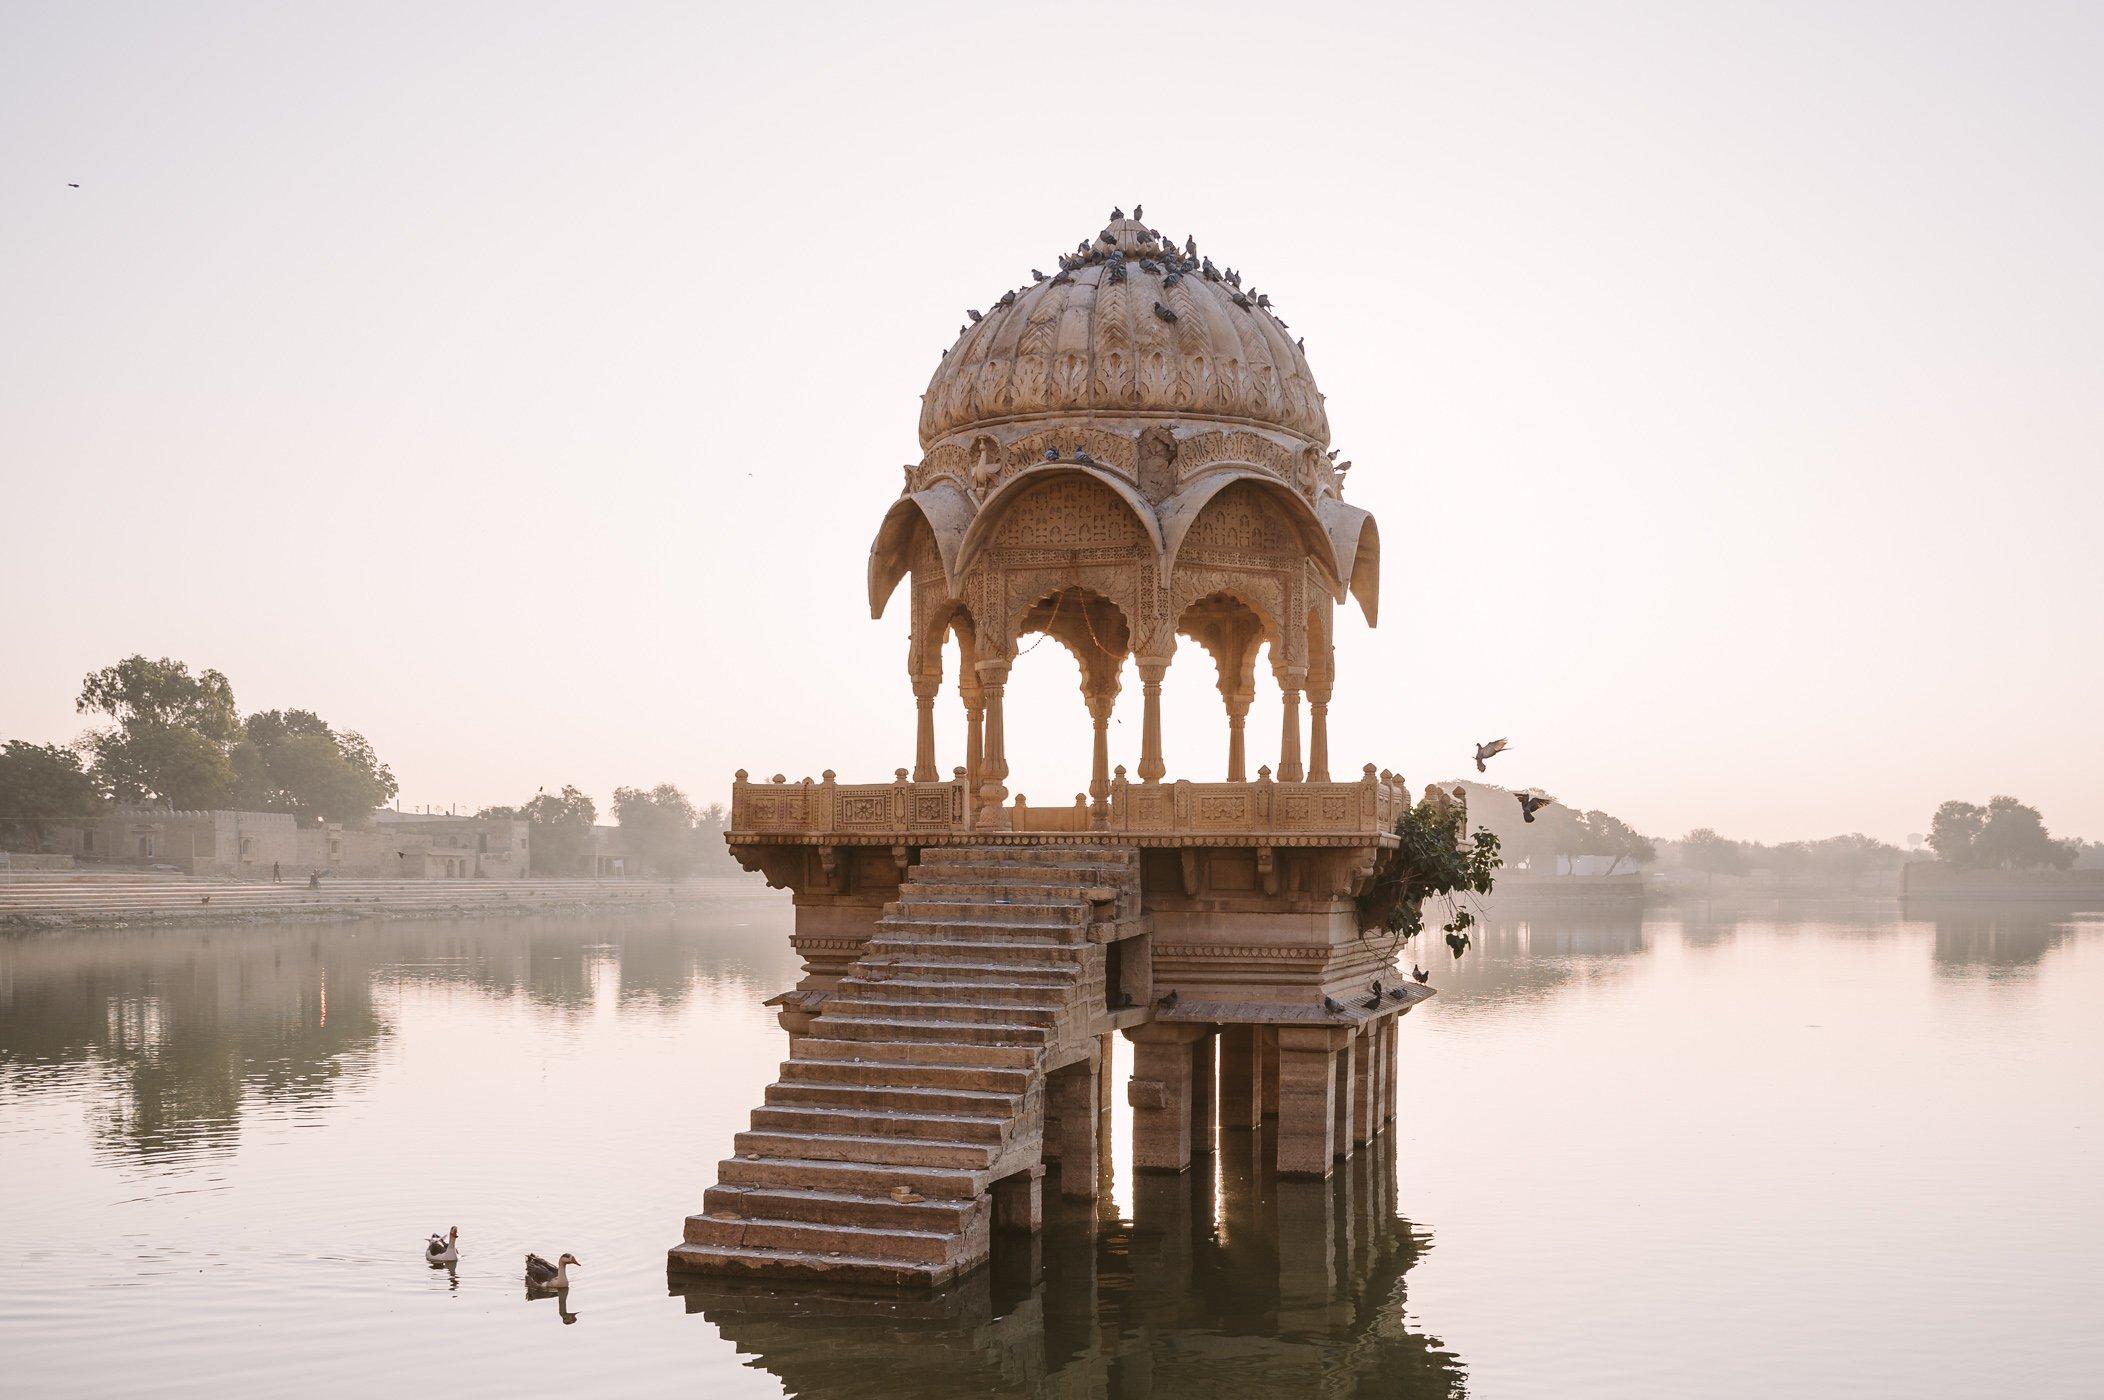 Chloé NOMADE Absolu de Parfum in Rajasthan India